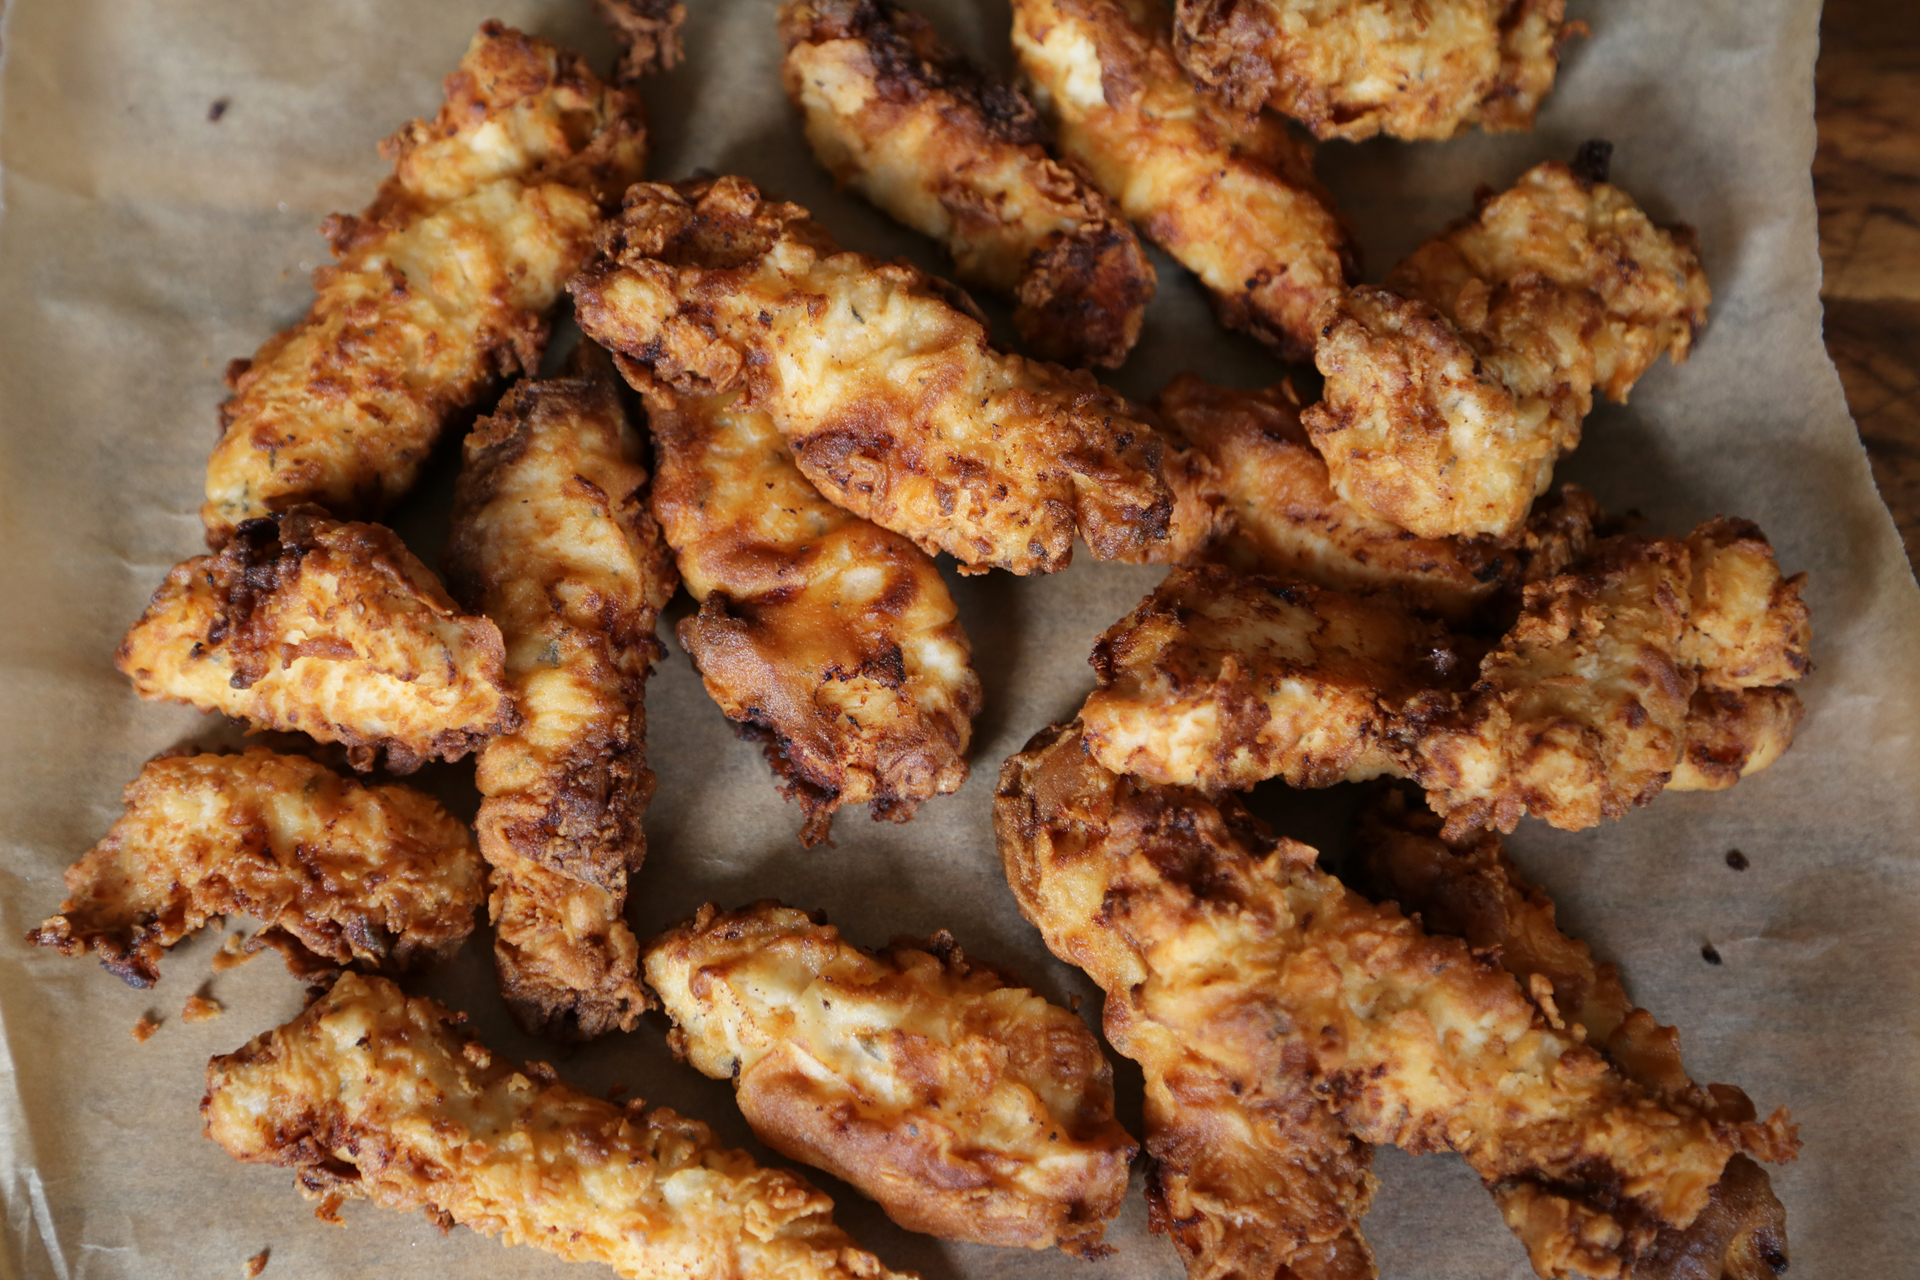 Buttermilk Chicken Fried Chicken Fingers ready to eat!